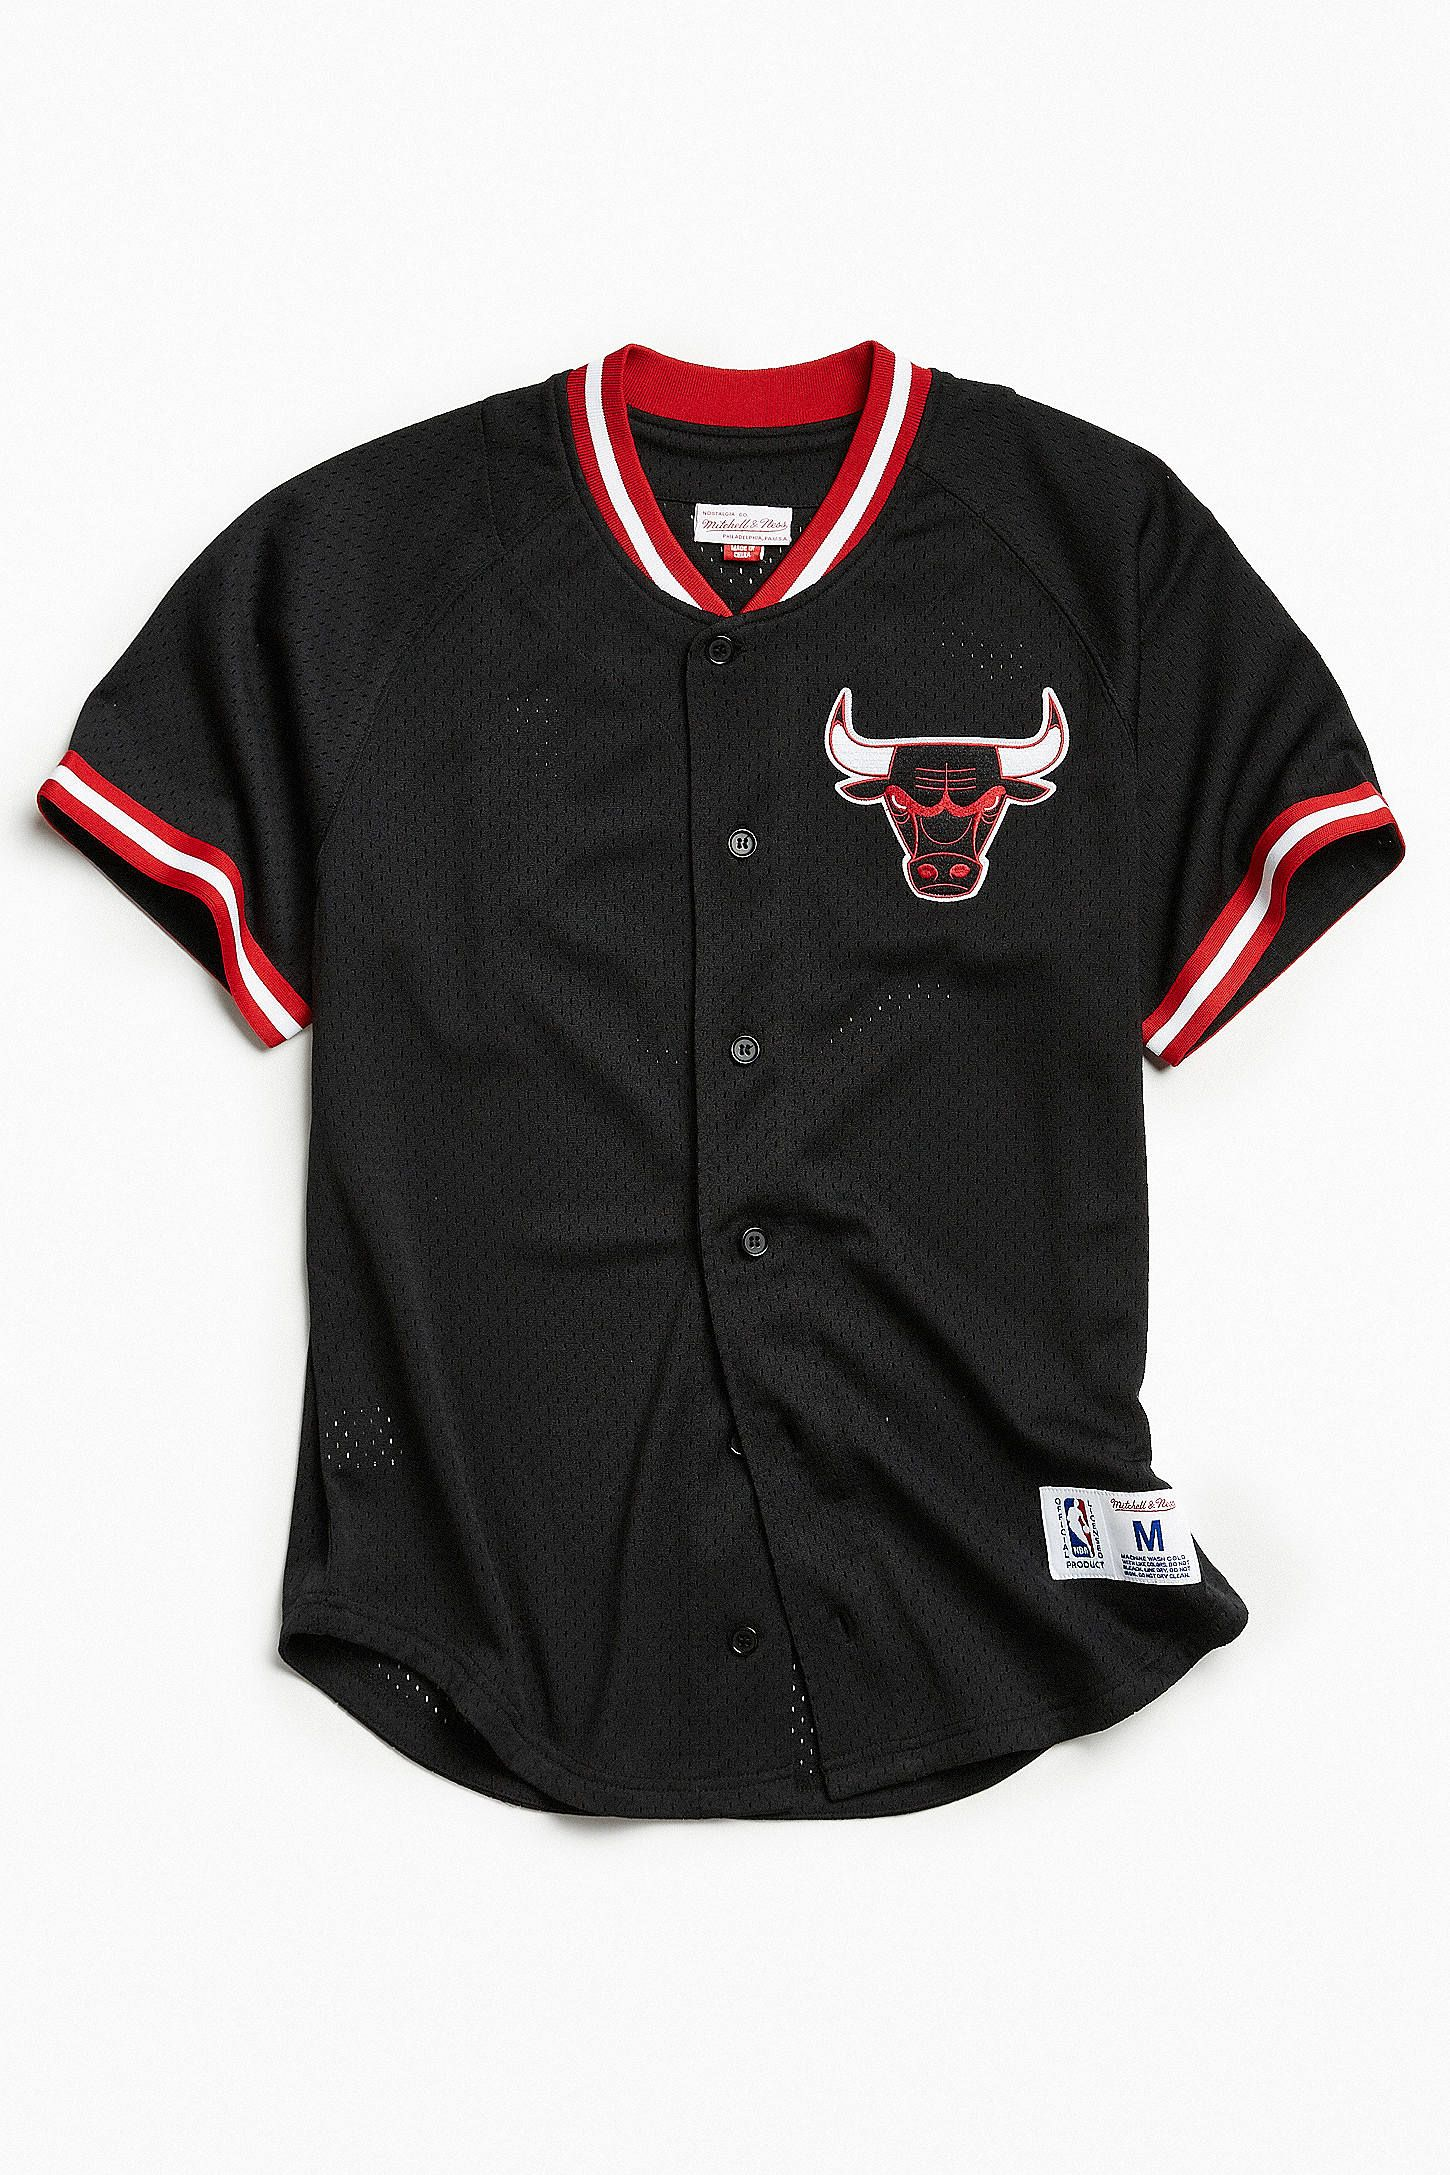 e8d99b14817 shopping mens starter red black chicago bulls baseball jersey 93ee4 2b040;  sweden shop mitchell ness chicago bulls button front jersey at urban  outfitters ...